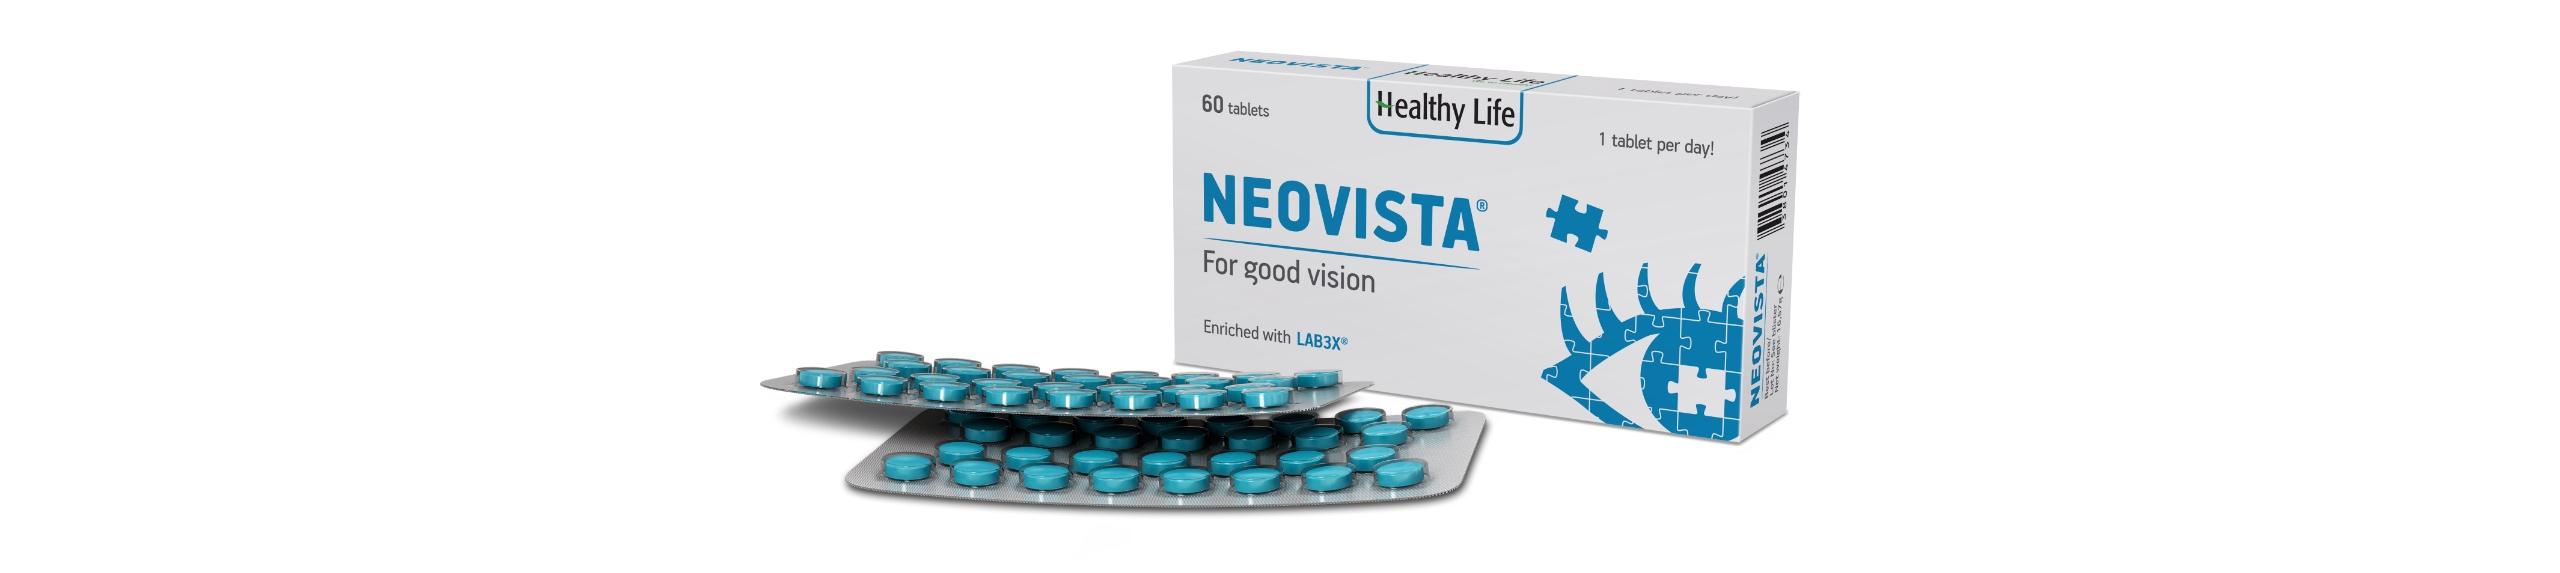 P3-Slider-img-Neovista1